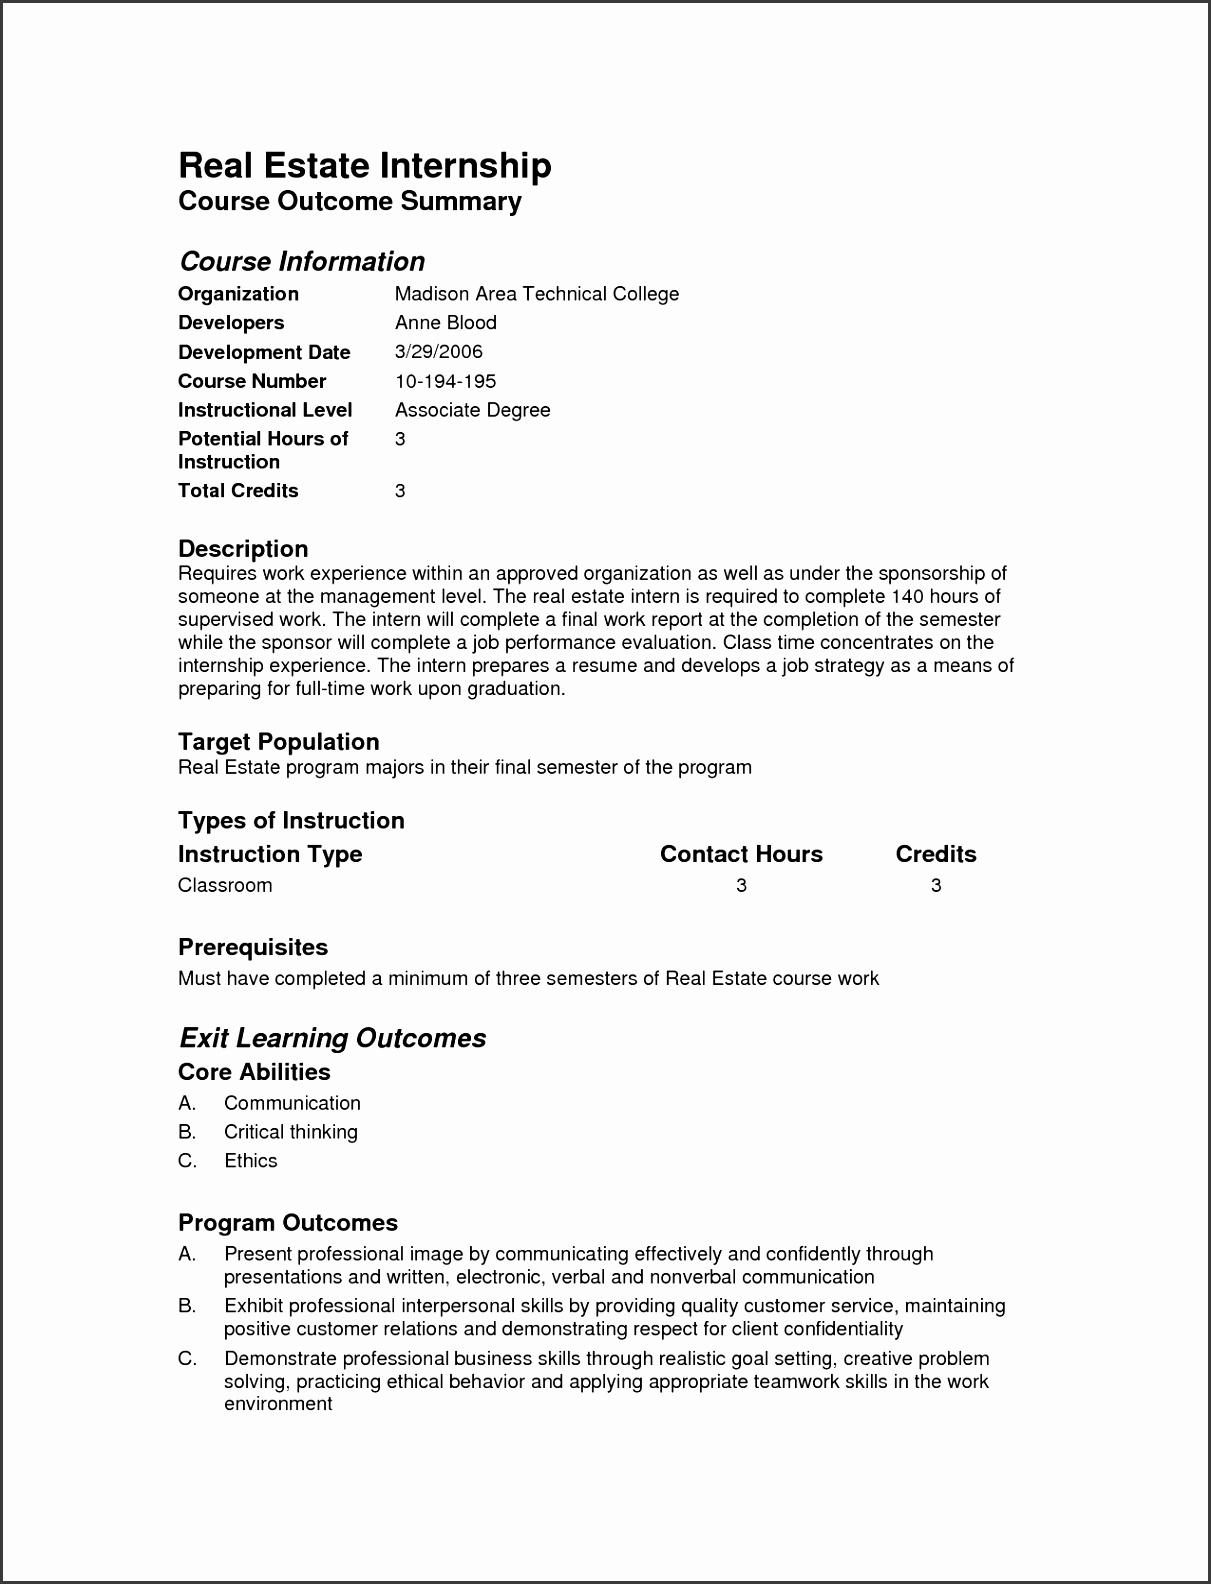 7 draft business plan template sampletemplatess sampletemplatess cover letter best s business plan sample letter cover examplebusiness plan cover letter extra medium friedricerecipe Image collections